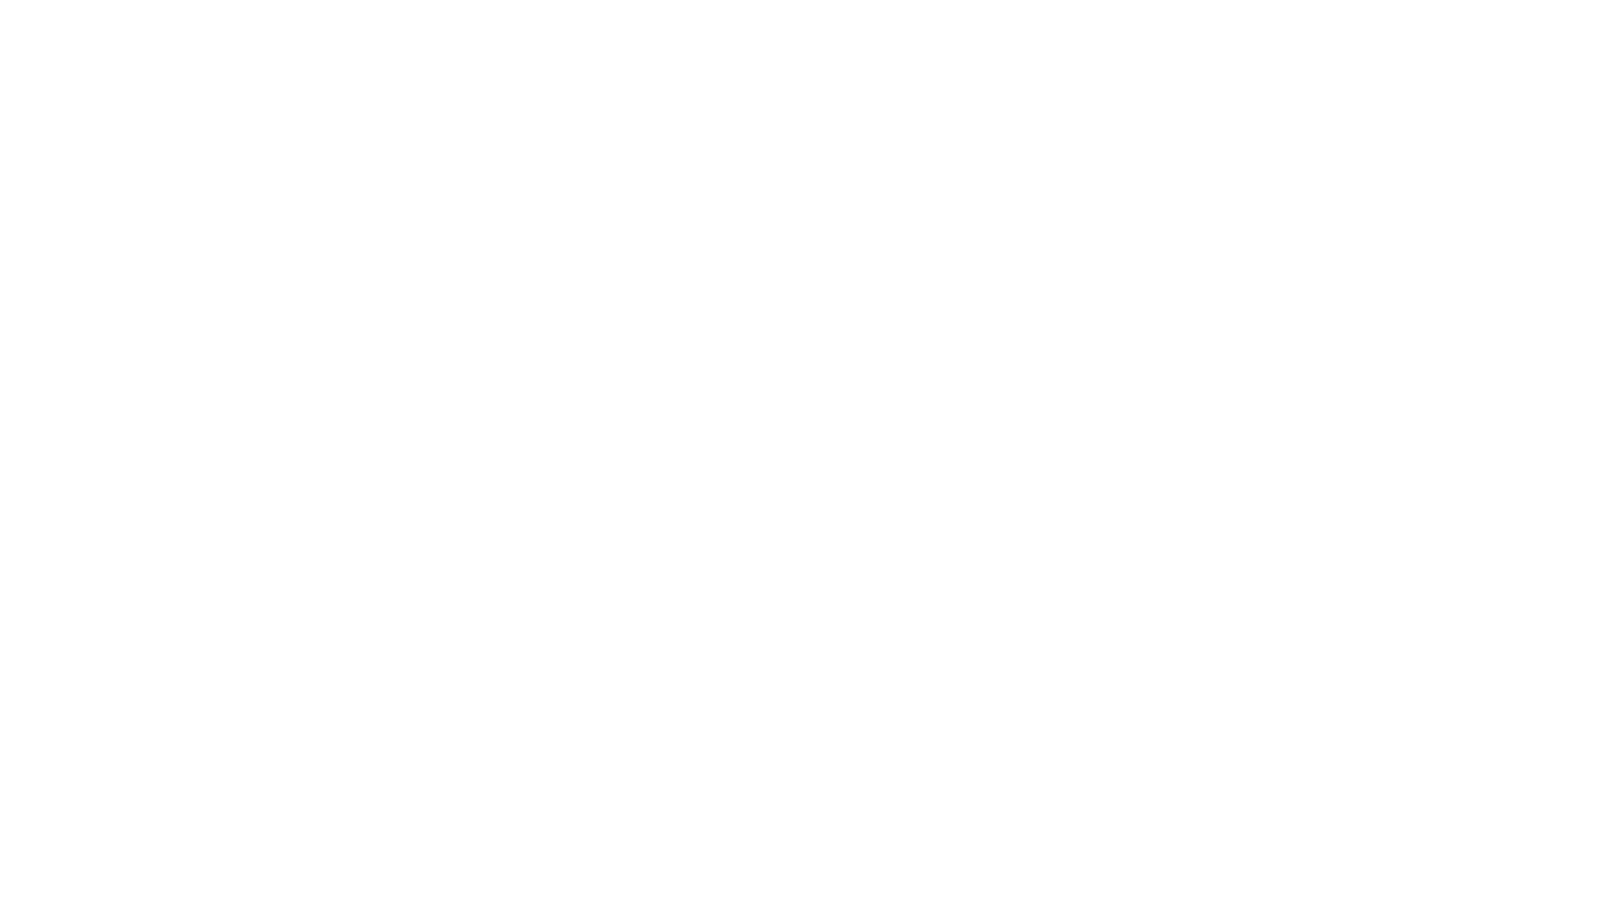 Interview with Edwinson Medwin birds Farm Pallavaram chennai.(Taiyo, pets life 2, angry birds, bird lover, parrot, bird food recipes, amazon super bowl commercial 2019, pet farms, macaw parrot, pet birds, chennai, Pallavaram)  Social media links  Facebook: https://bit.ly/2rISRZ4 Instagram : @taiyoindia Twitter: @IndiaTaiyo  Email : digitalmarketing@taiyofeeds.com